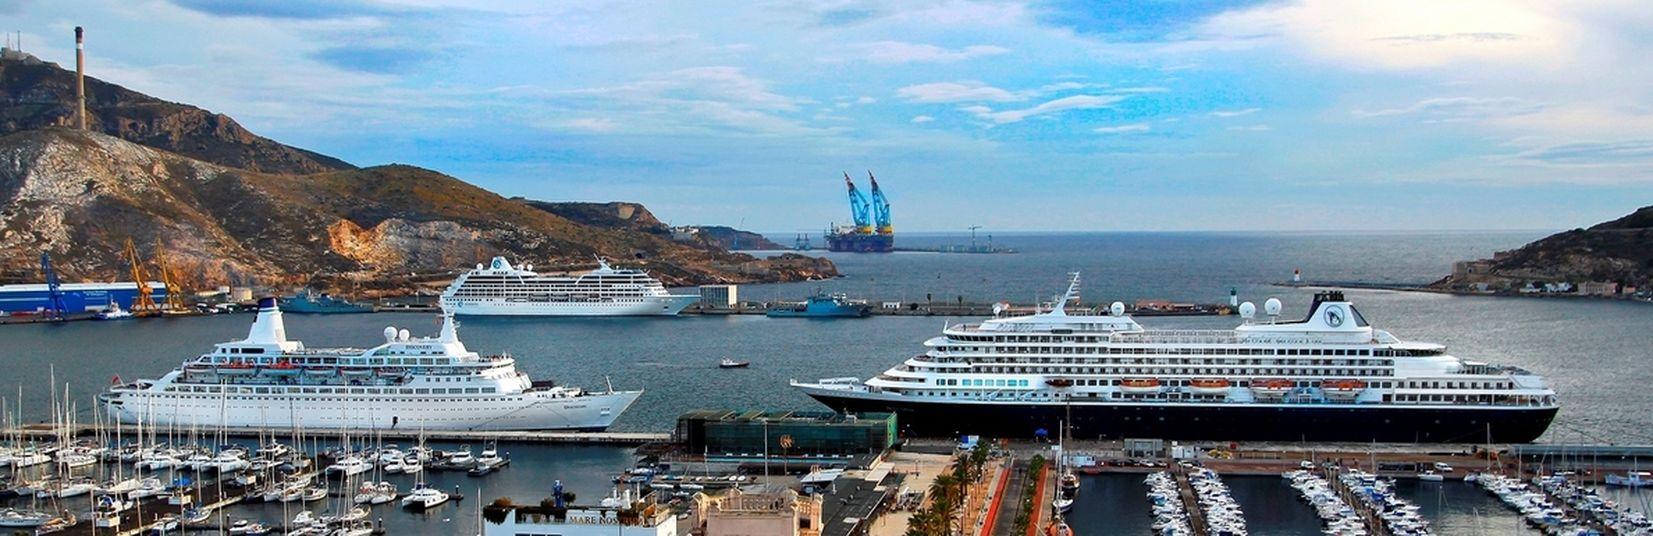 Puerto-Cartagena-elimina-recargos-practicaje_TINIMA20150412_0313_19